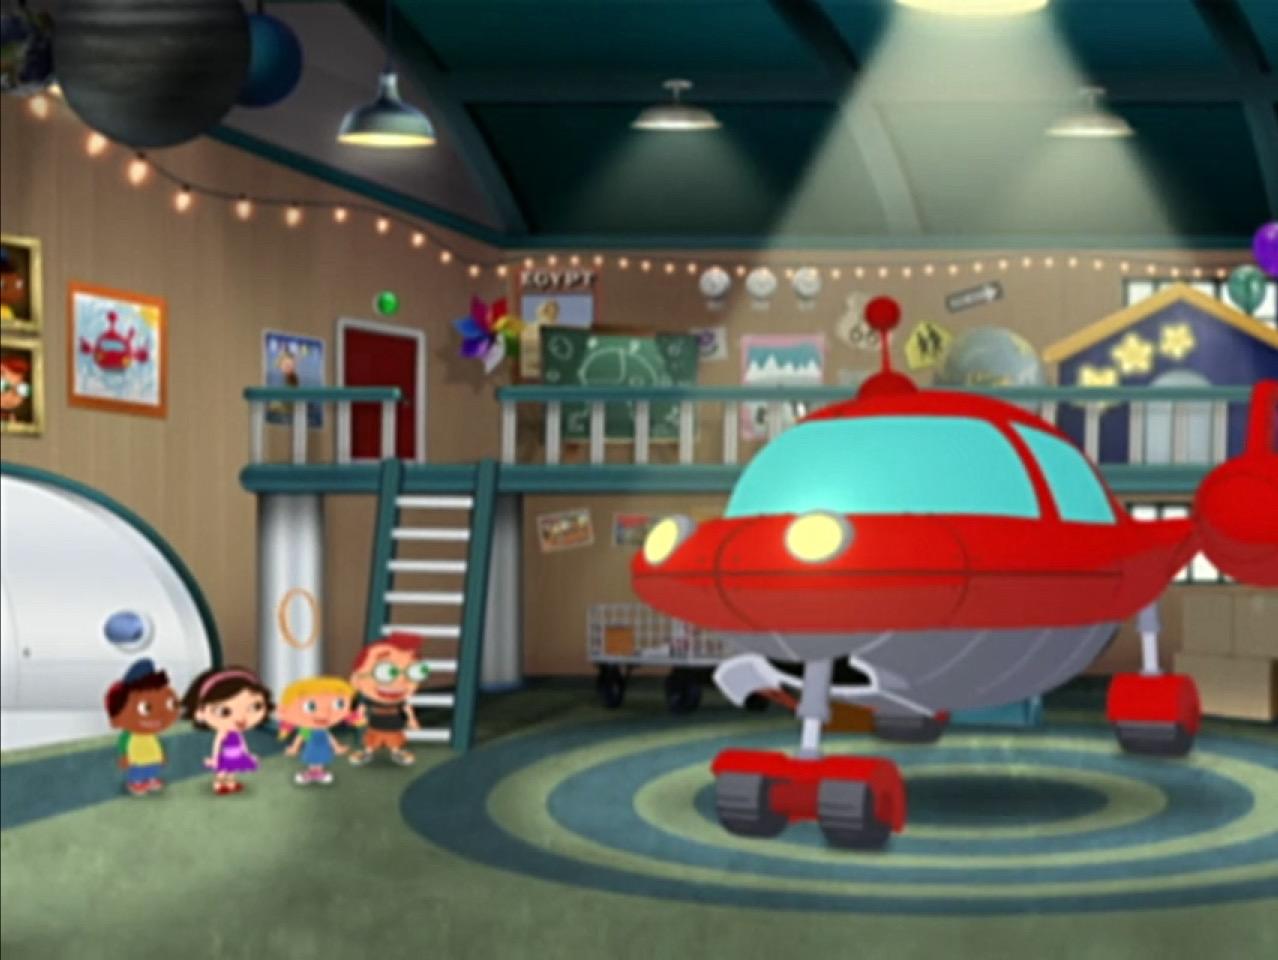 Uncategorized Rocket Little Einsteins image little einsteins rocket room jpg disney wiki fandom powered by wikia